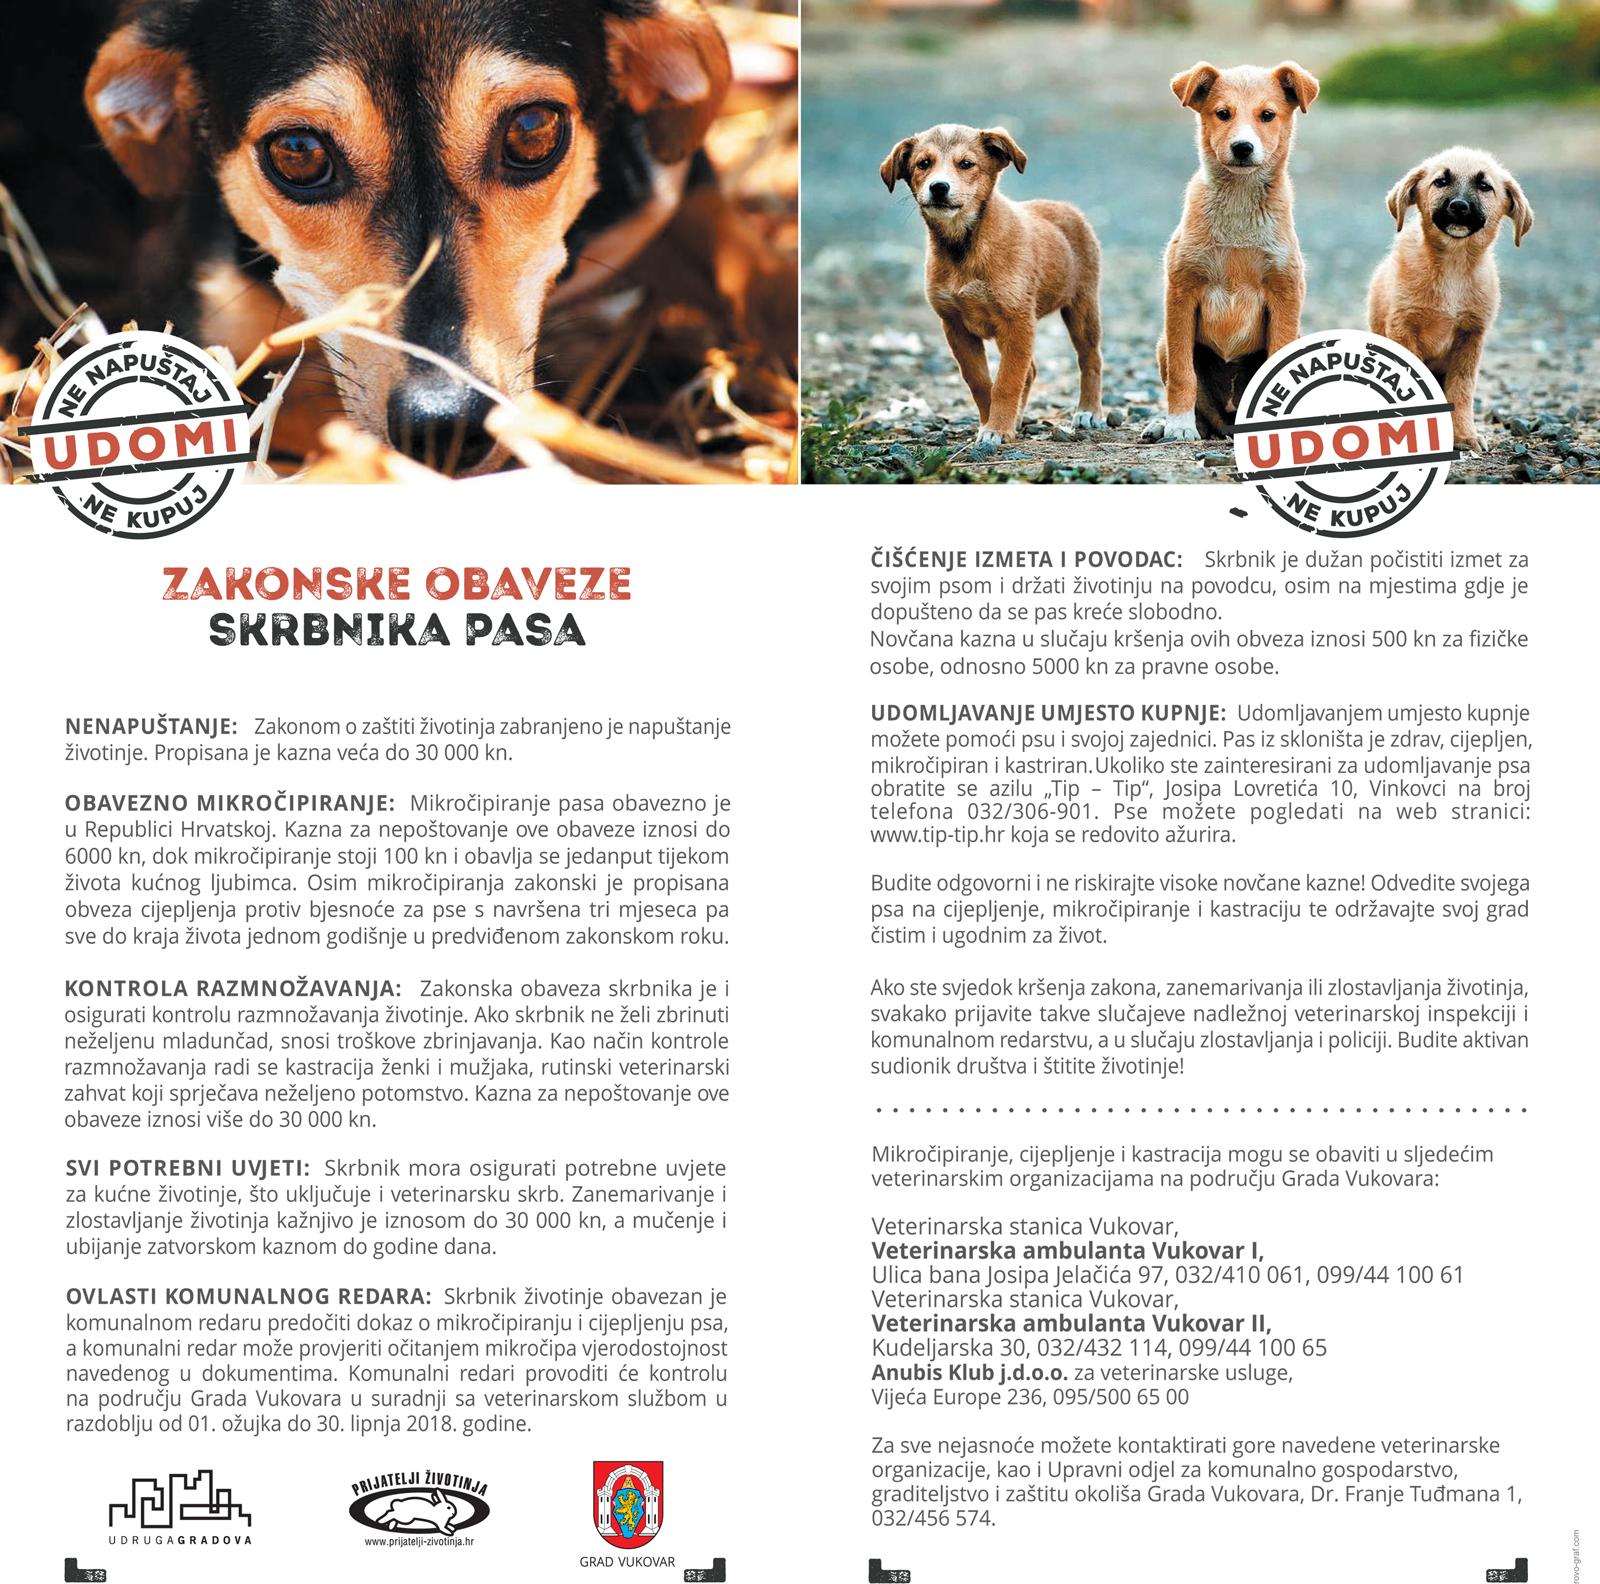 LokalnaHrvatska.hr Vukovar Zakonske obveze skrbnika pasa